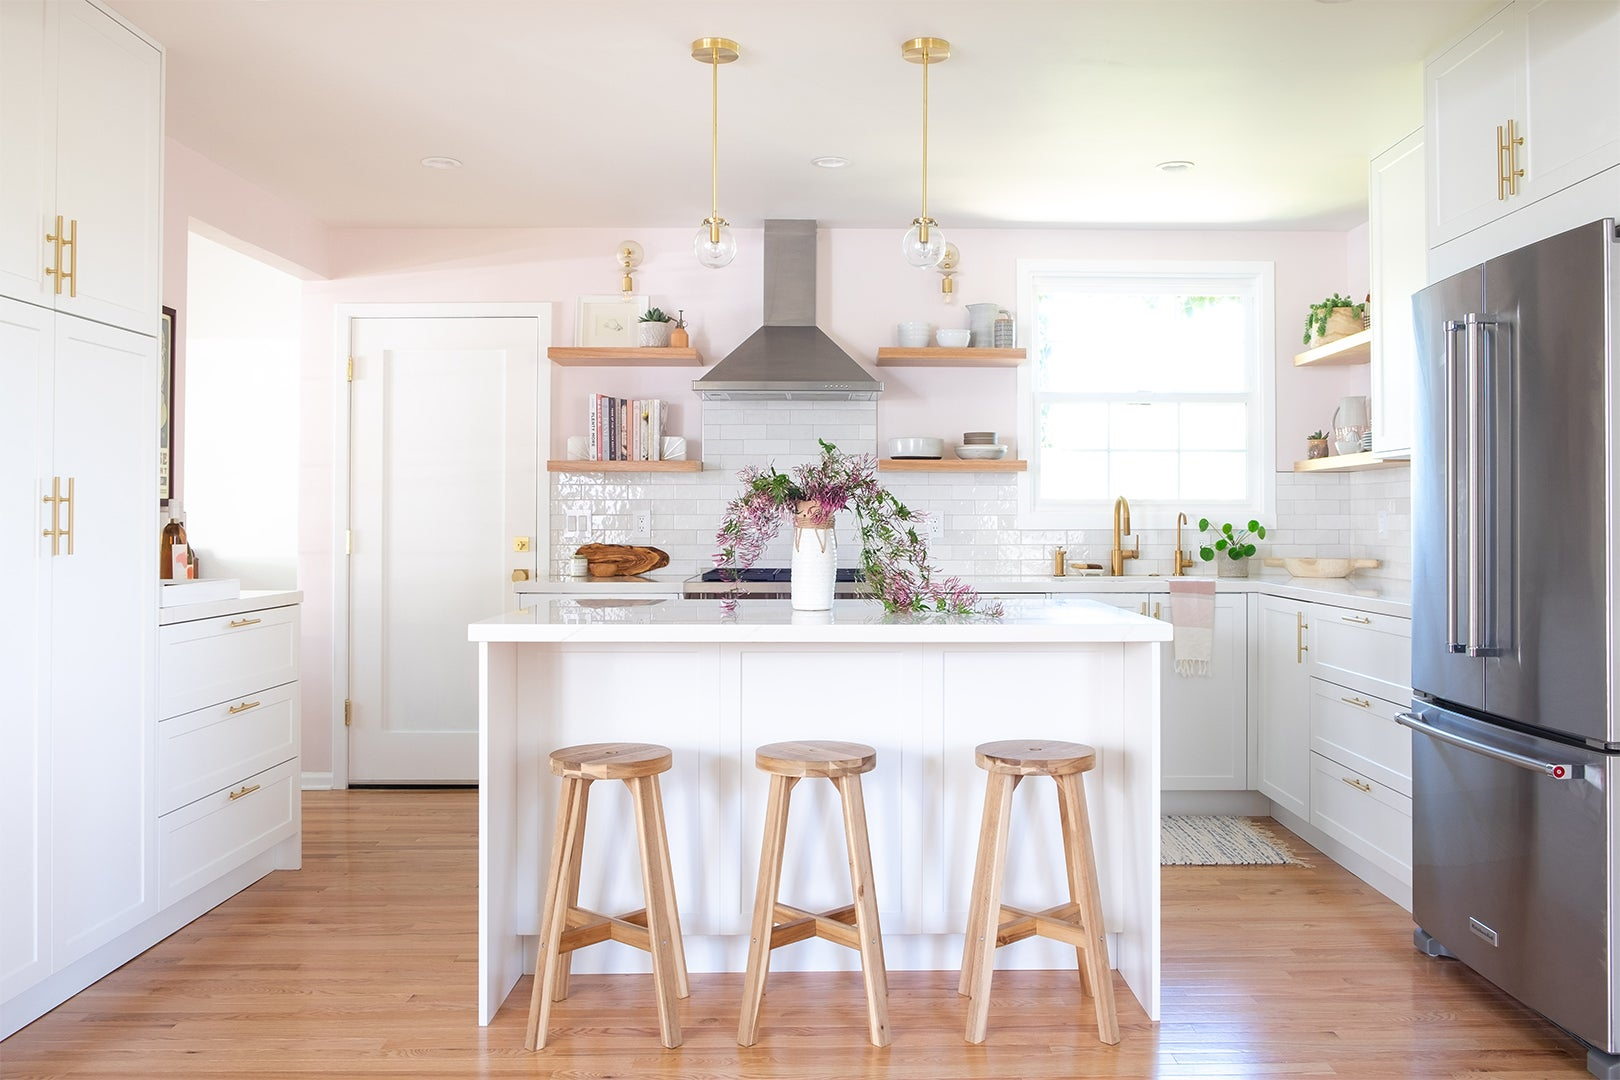 white island in a pink kitchen